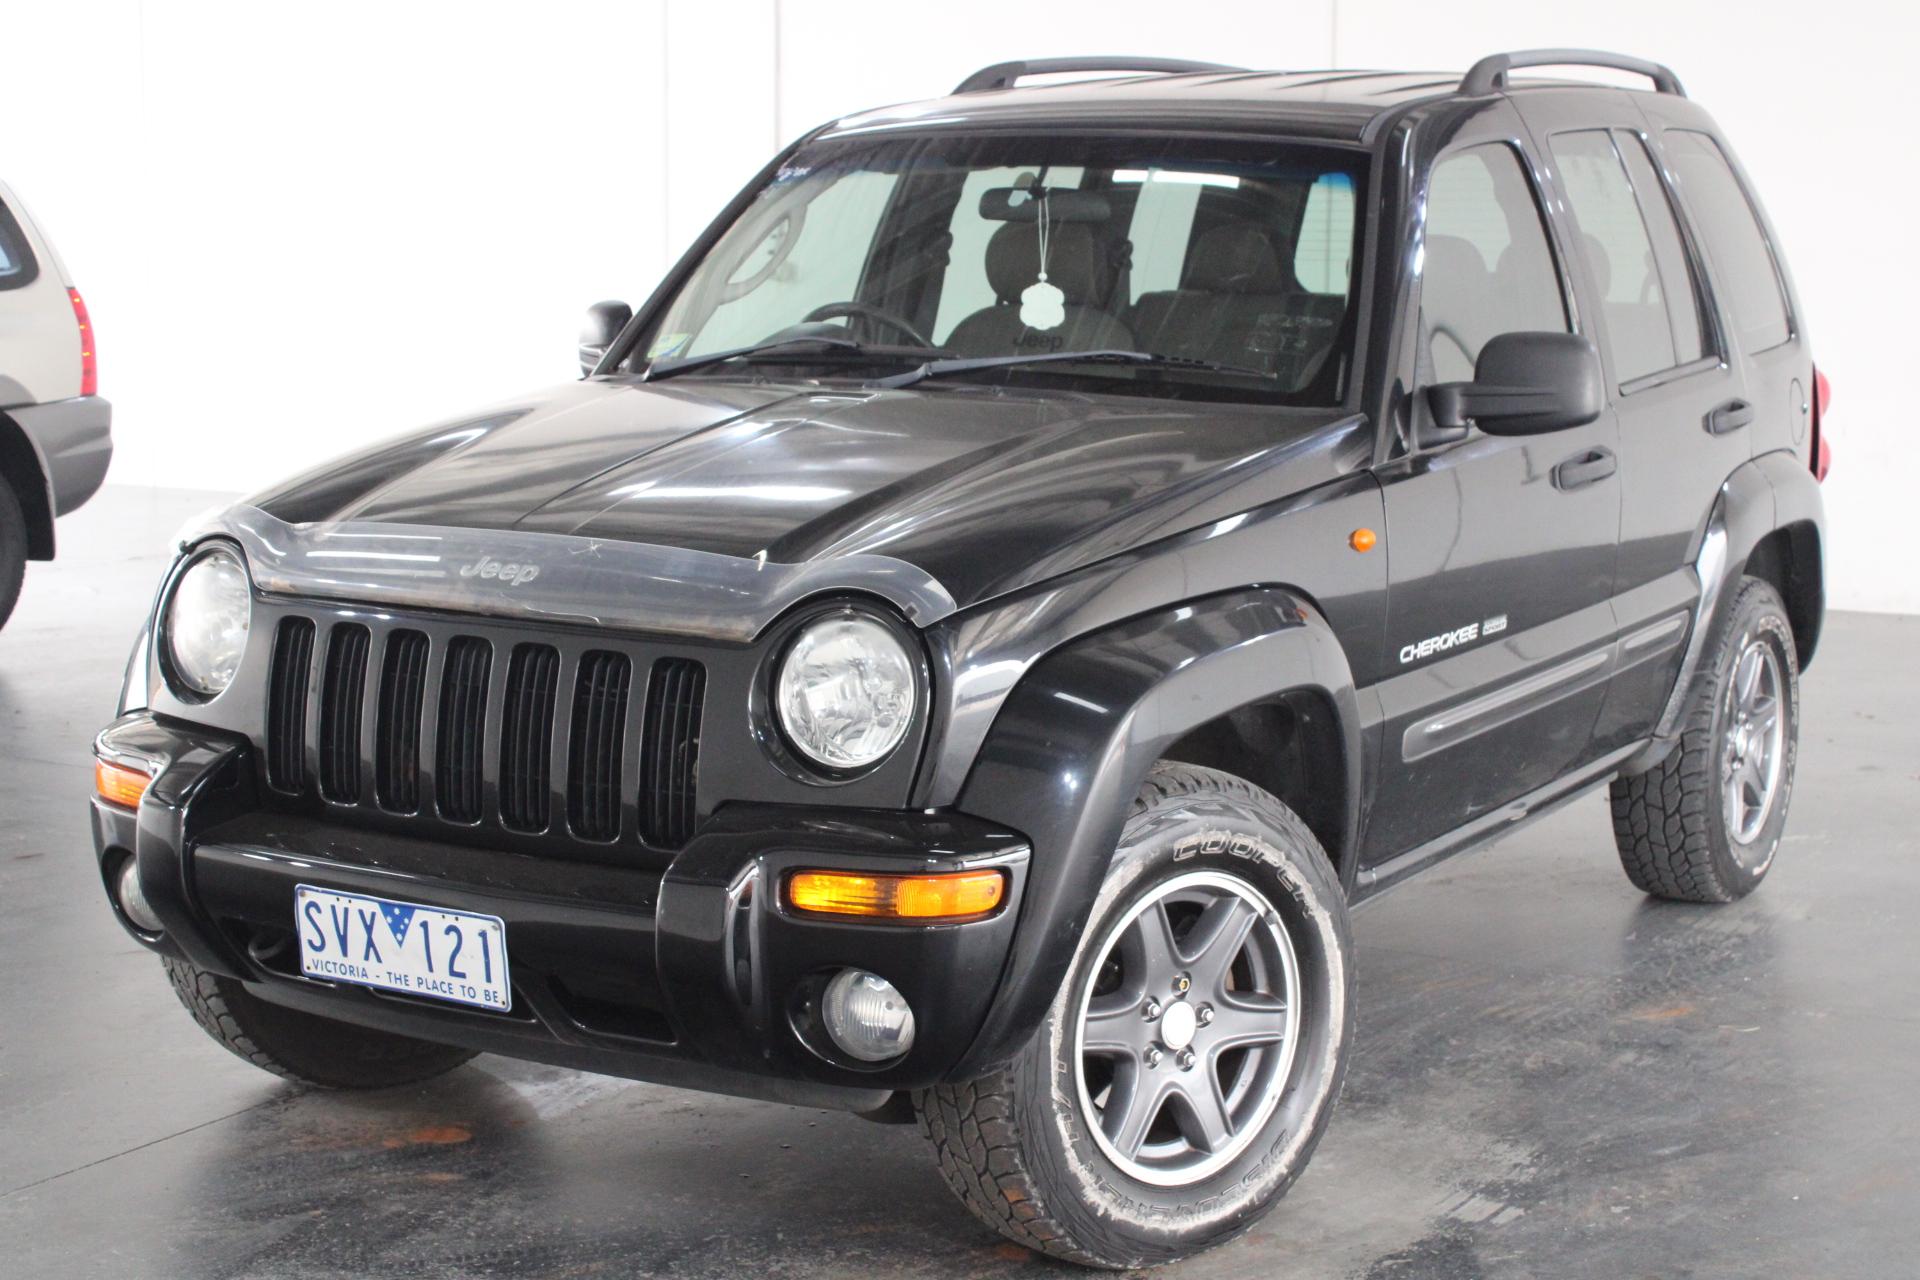 2004 Jeep Cherokee Sport (4x4) KJ Automatic Wagon